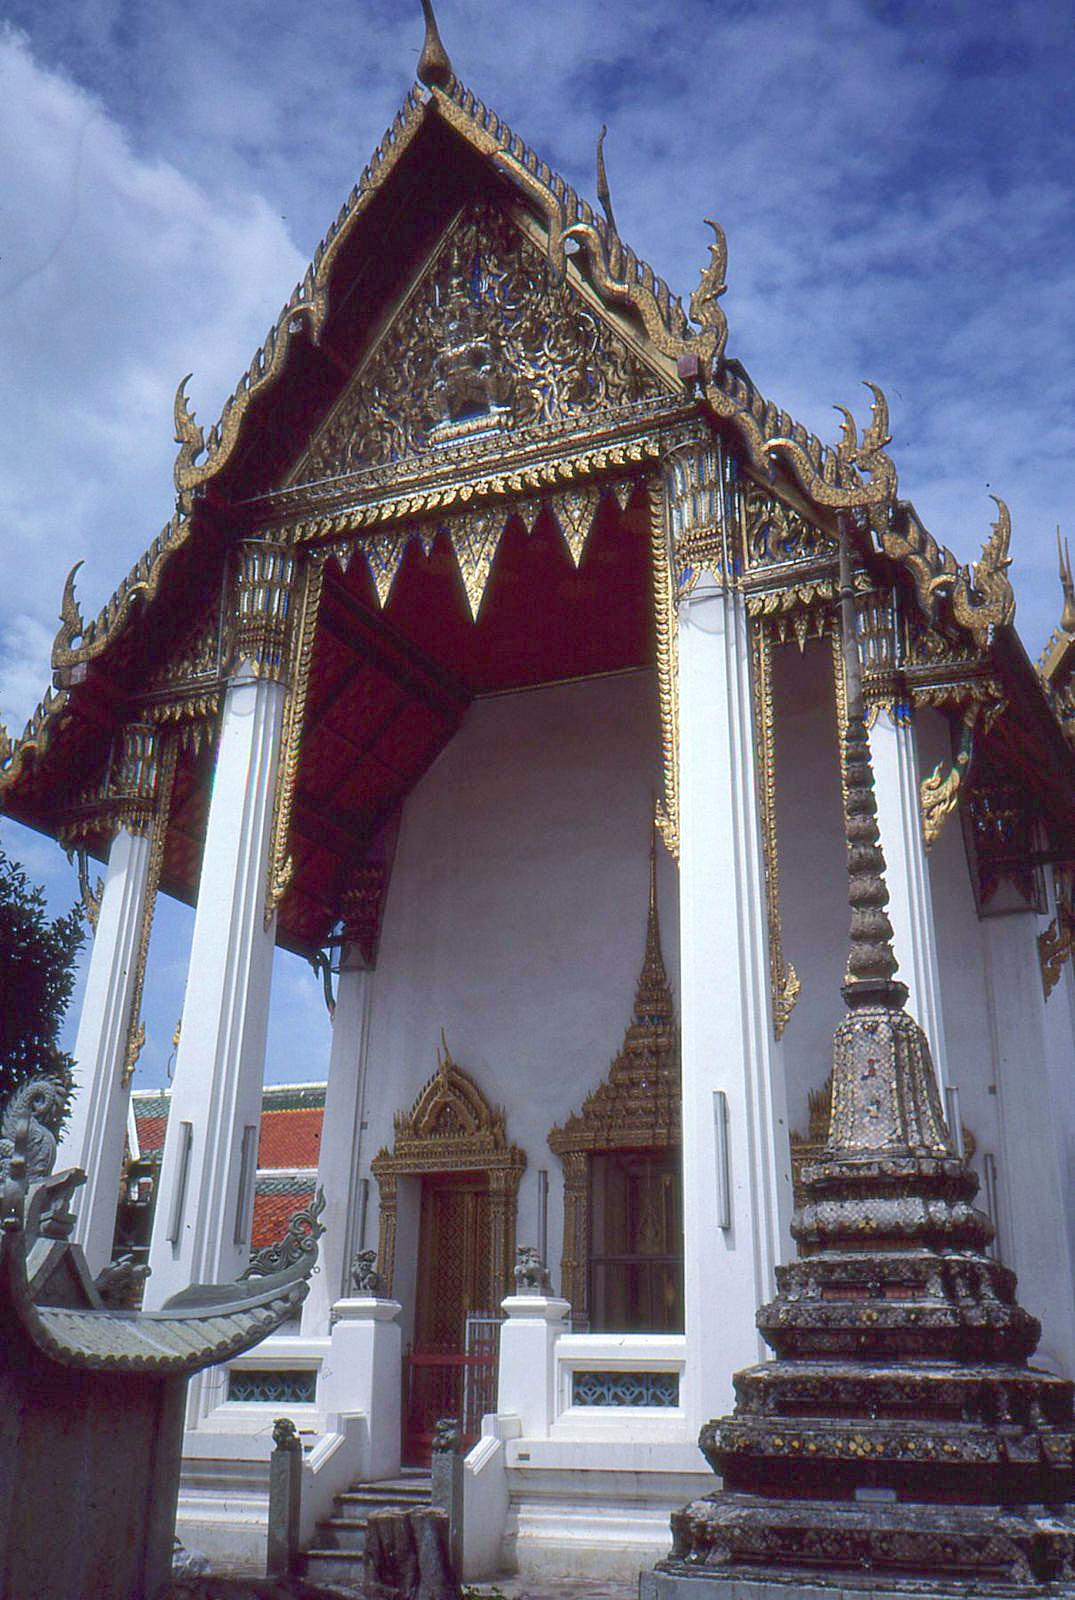 1986 Bangkok by Geoff Whitfield 84.jpg